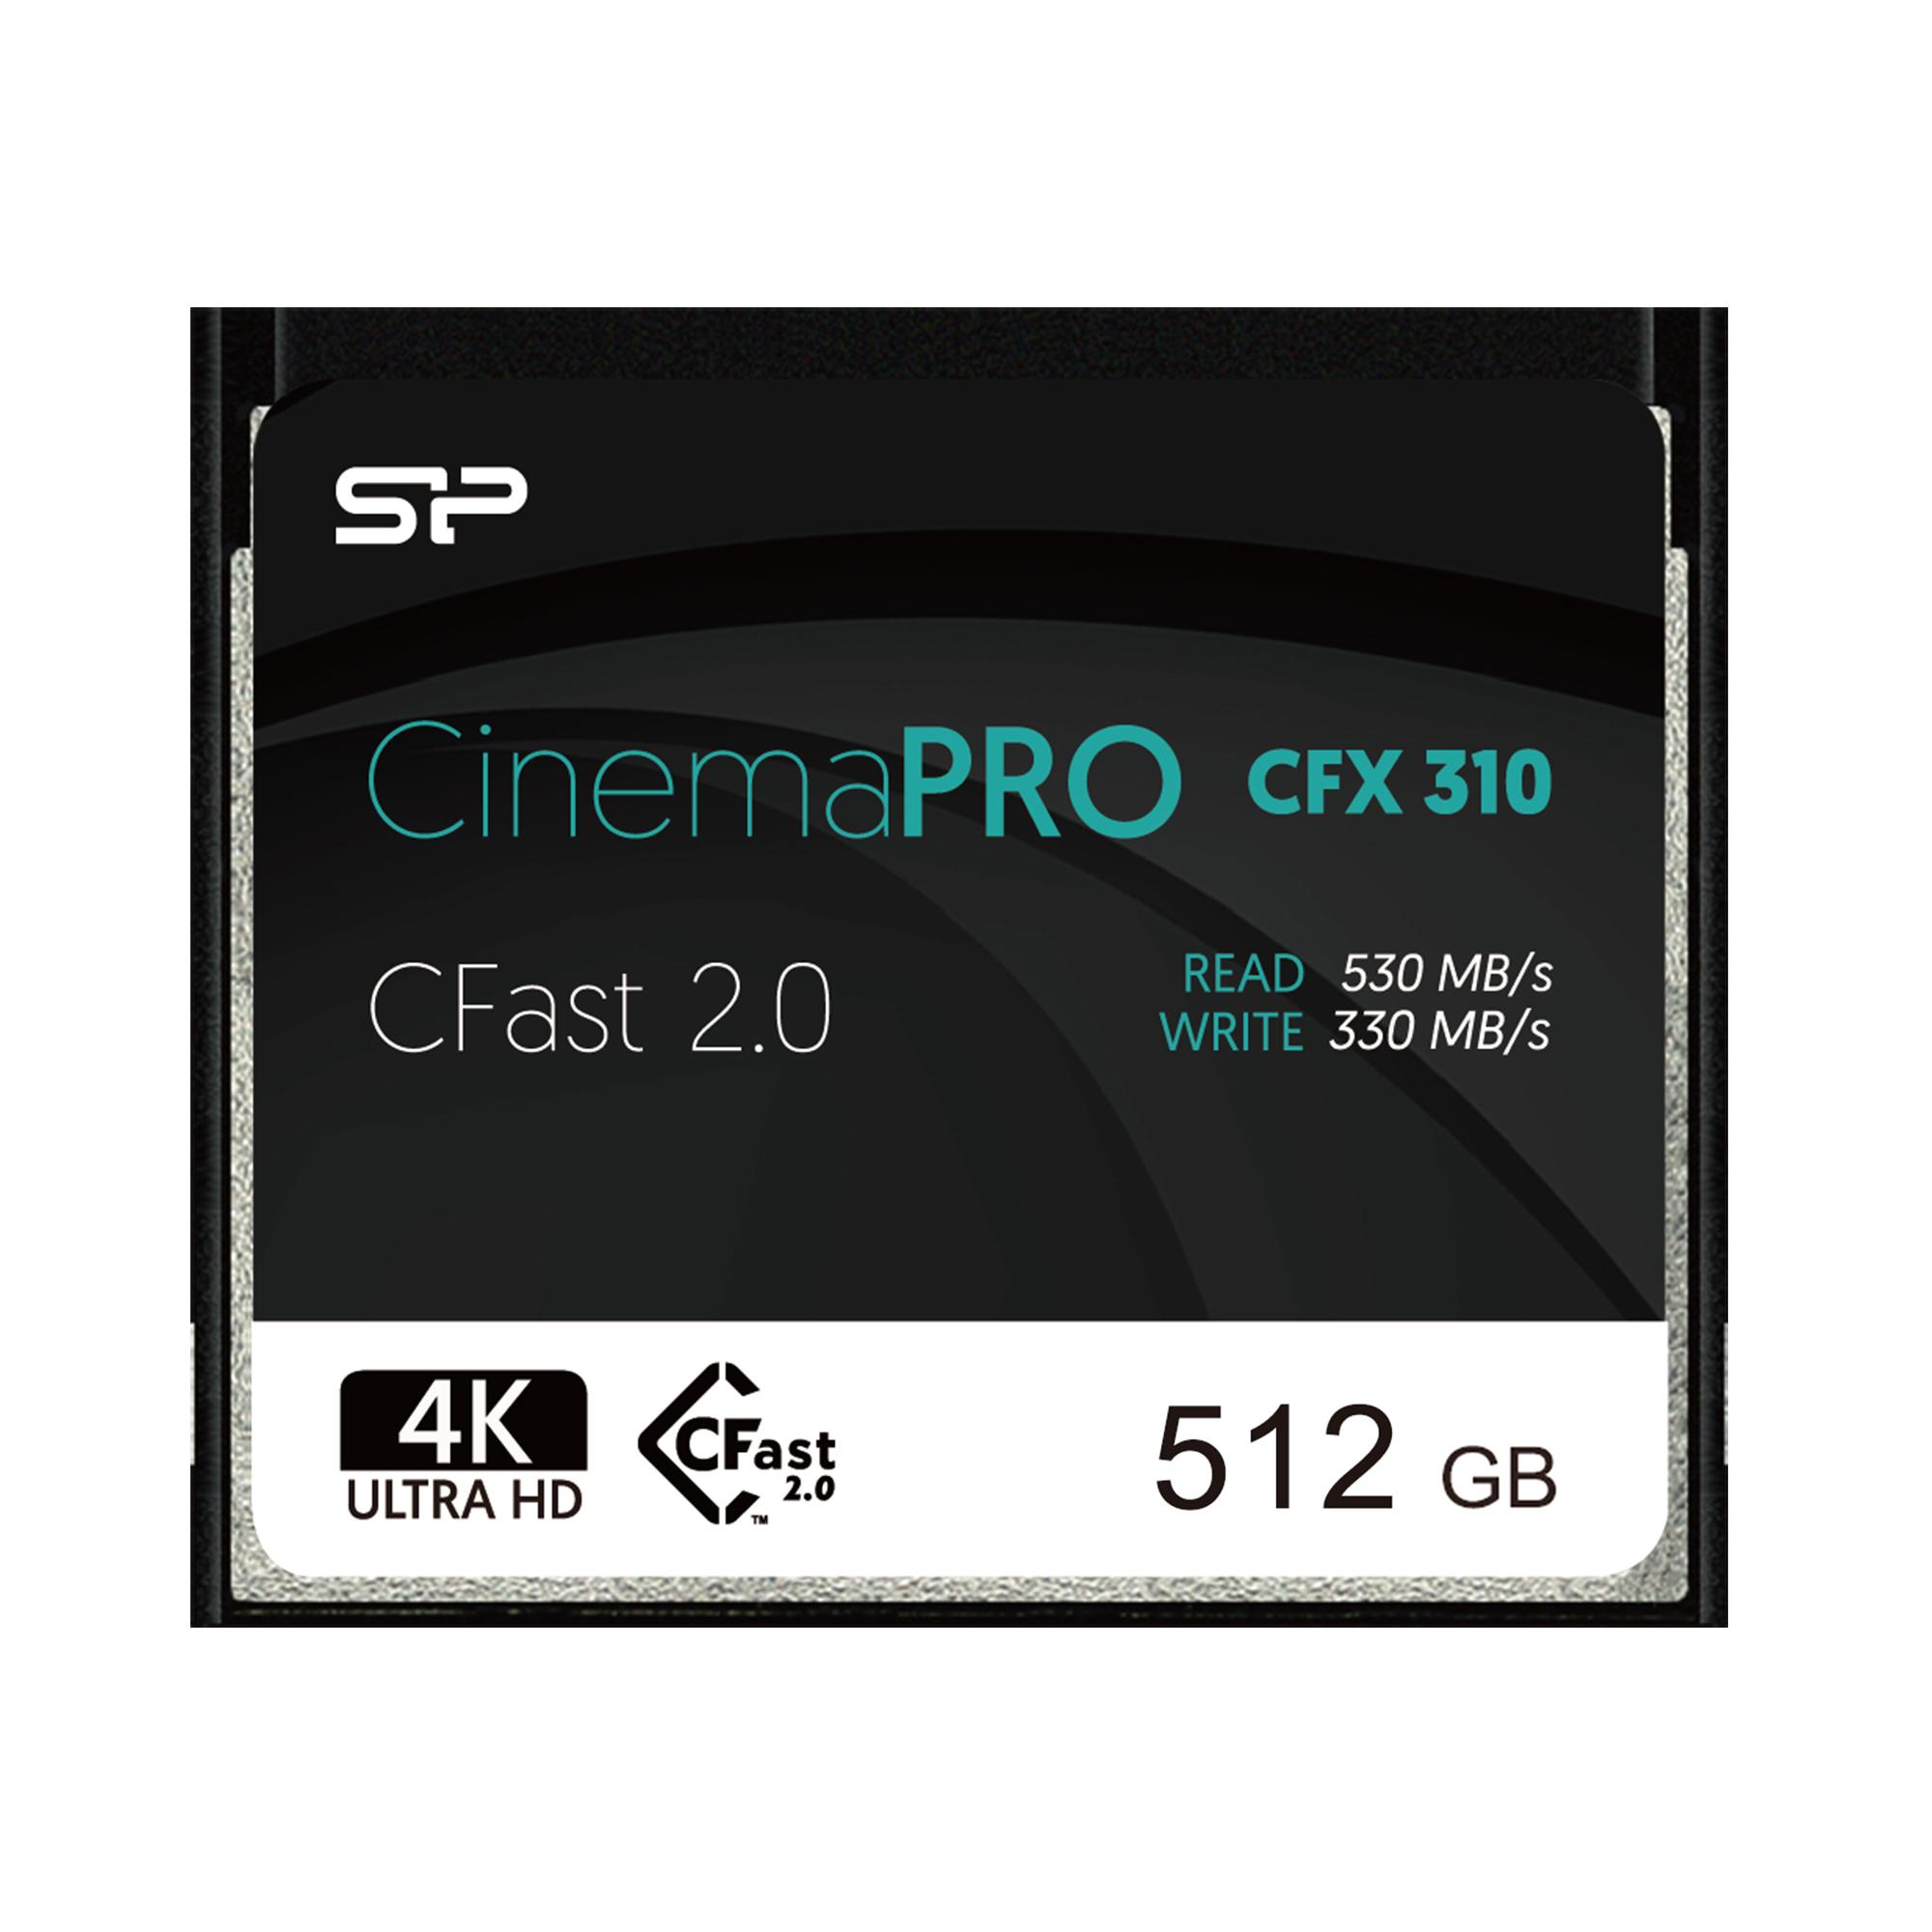 Silicon Power 512GB CFast 2.0 CinemaPro 530MB/s CFX310 MLC Memory Card SP512GICFX311NV0BM